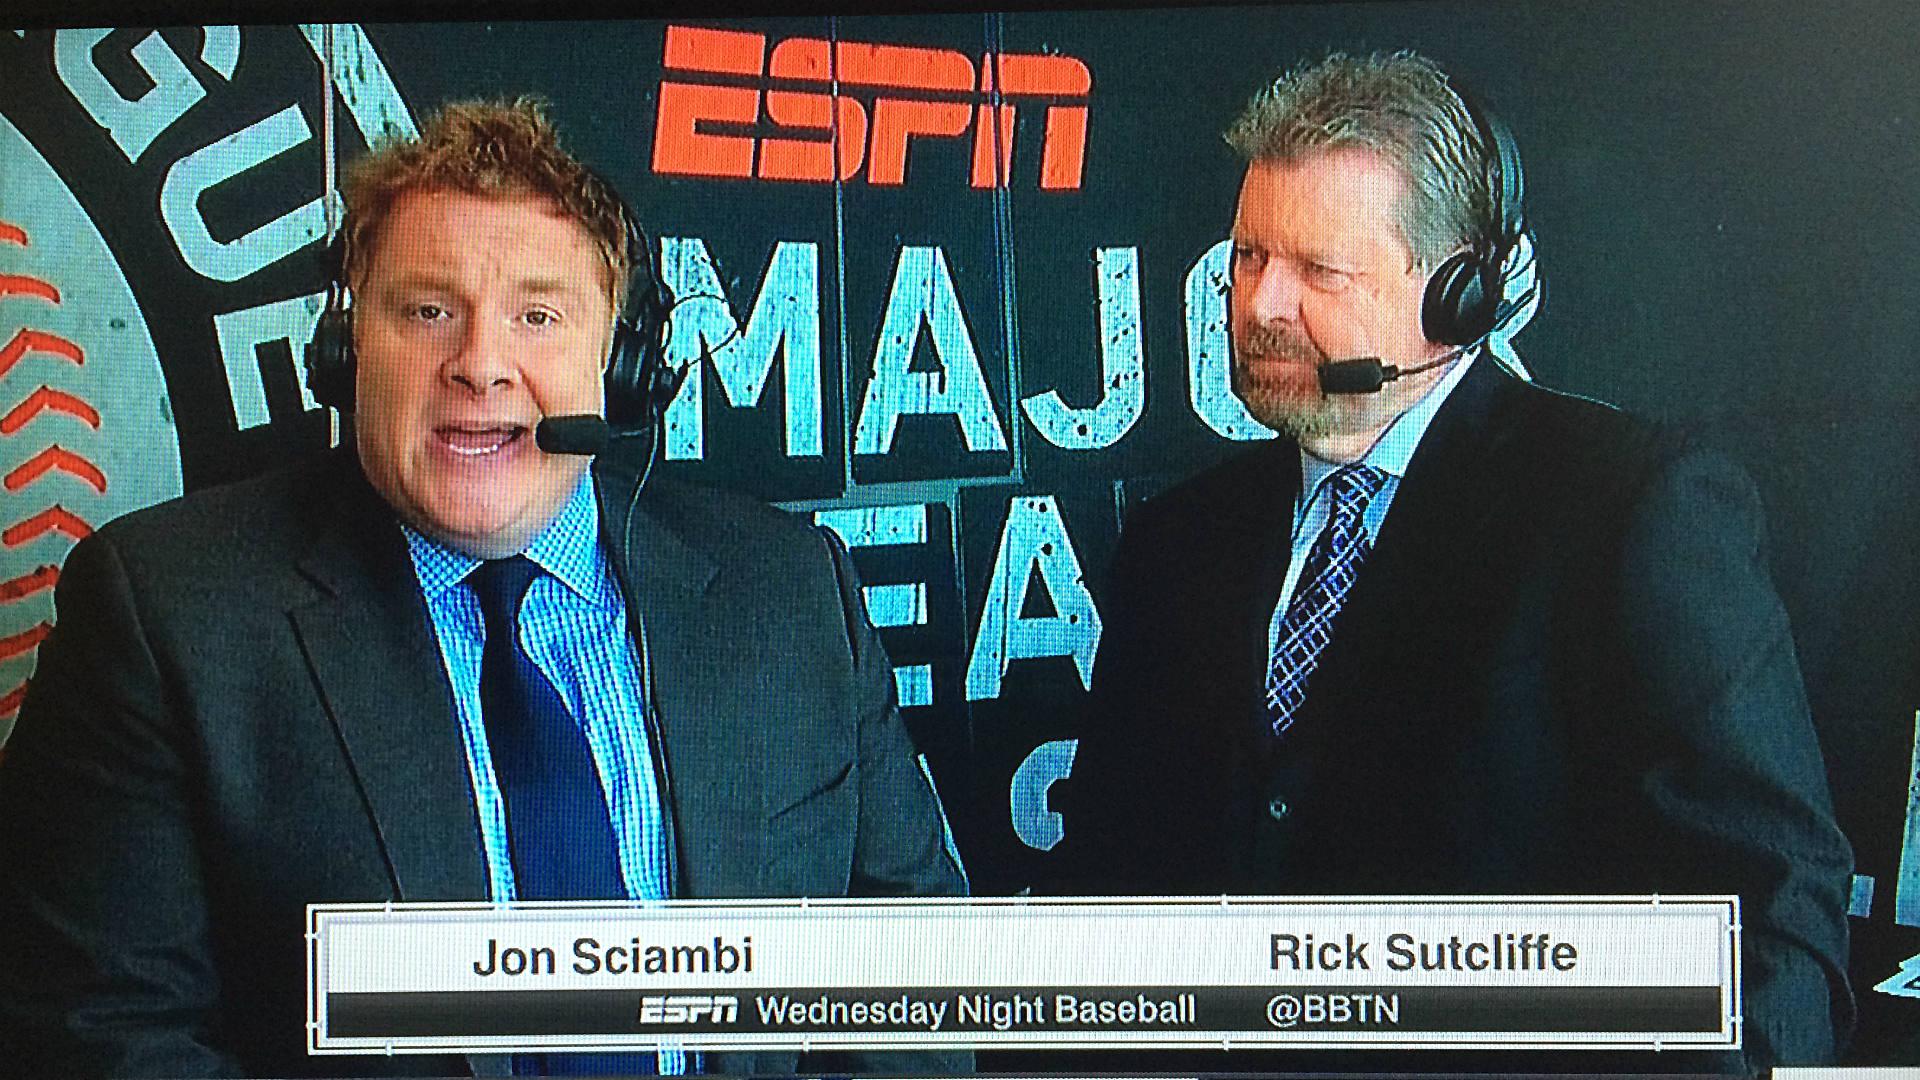 Jon 'Boog' Sciambi emerges as lead candidate to call ESPN's 'Sunday Night Baseball'